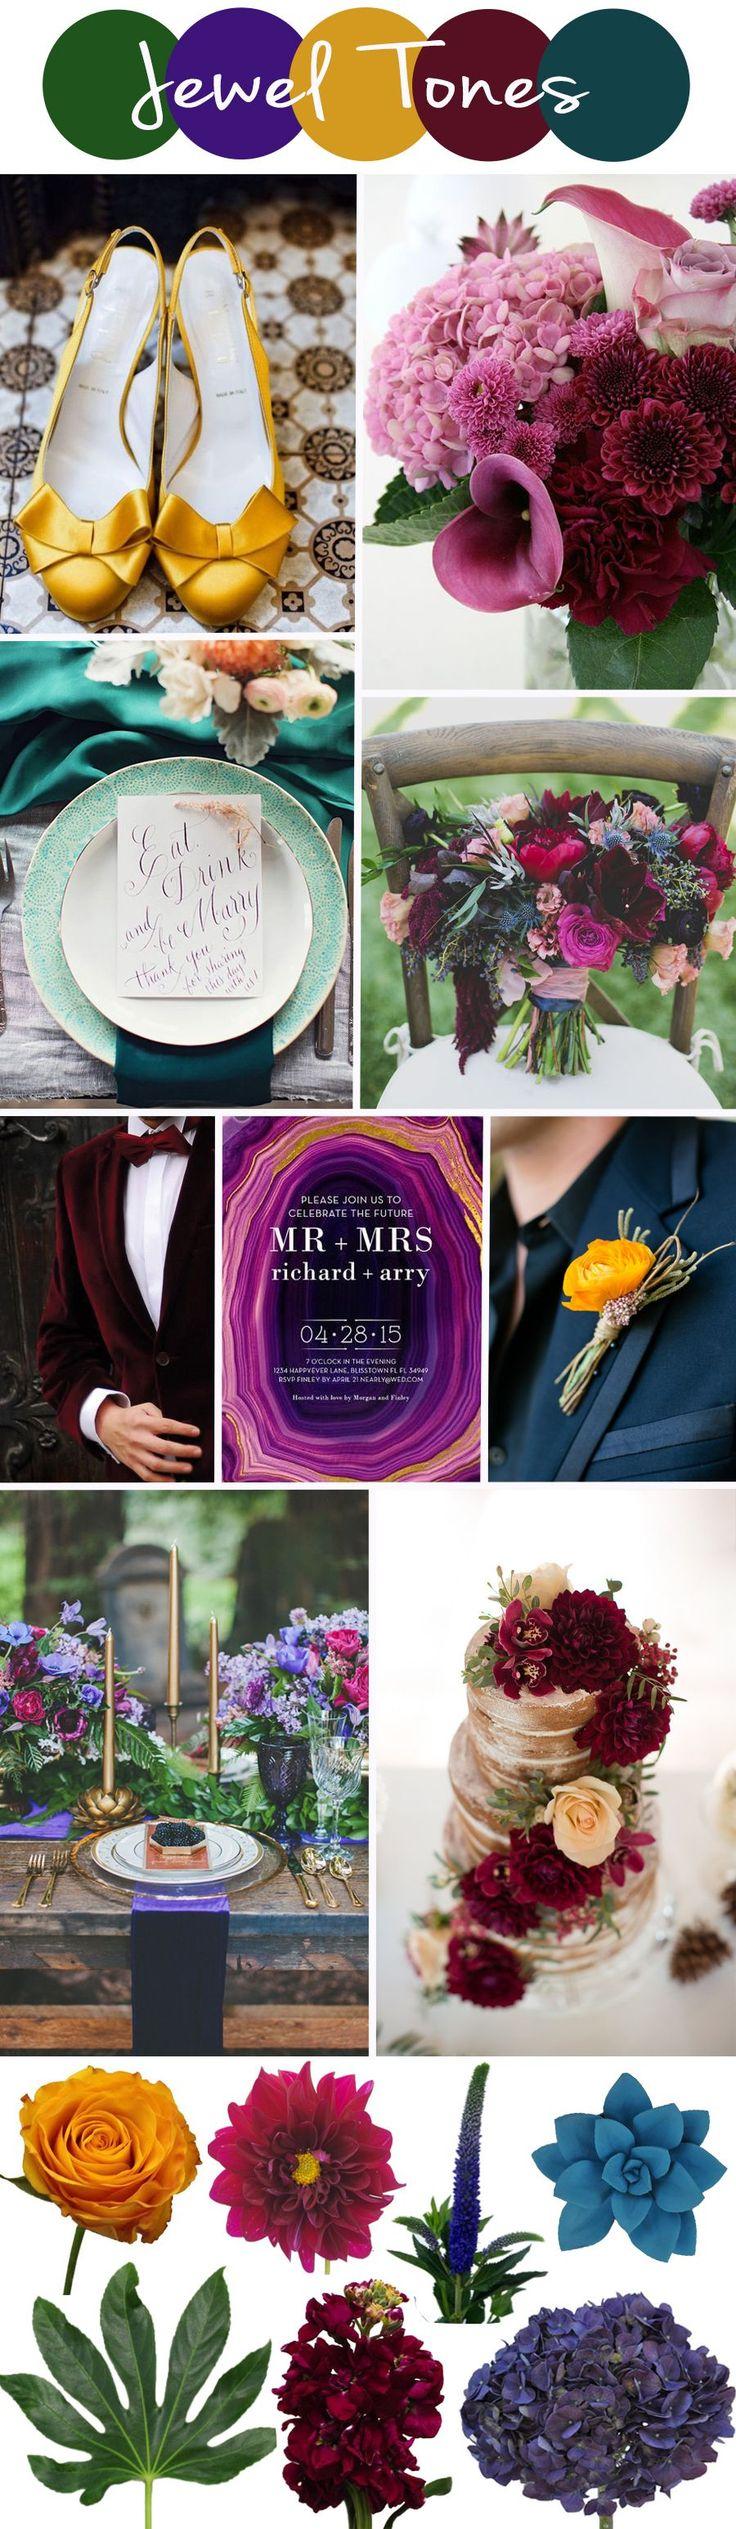 Design Jewel Tones best 25 jewel tone colors ideas on pinterest fiftyflowers wedding inspiration